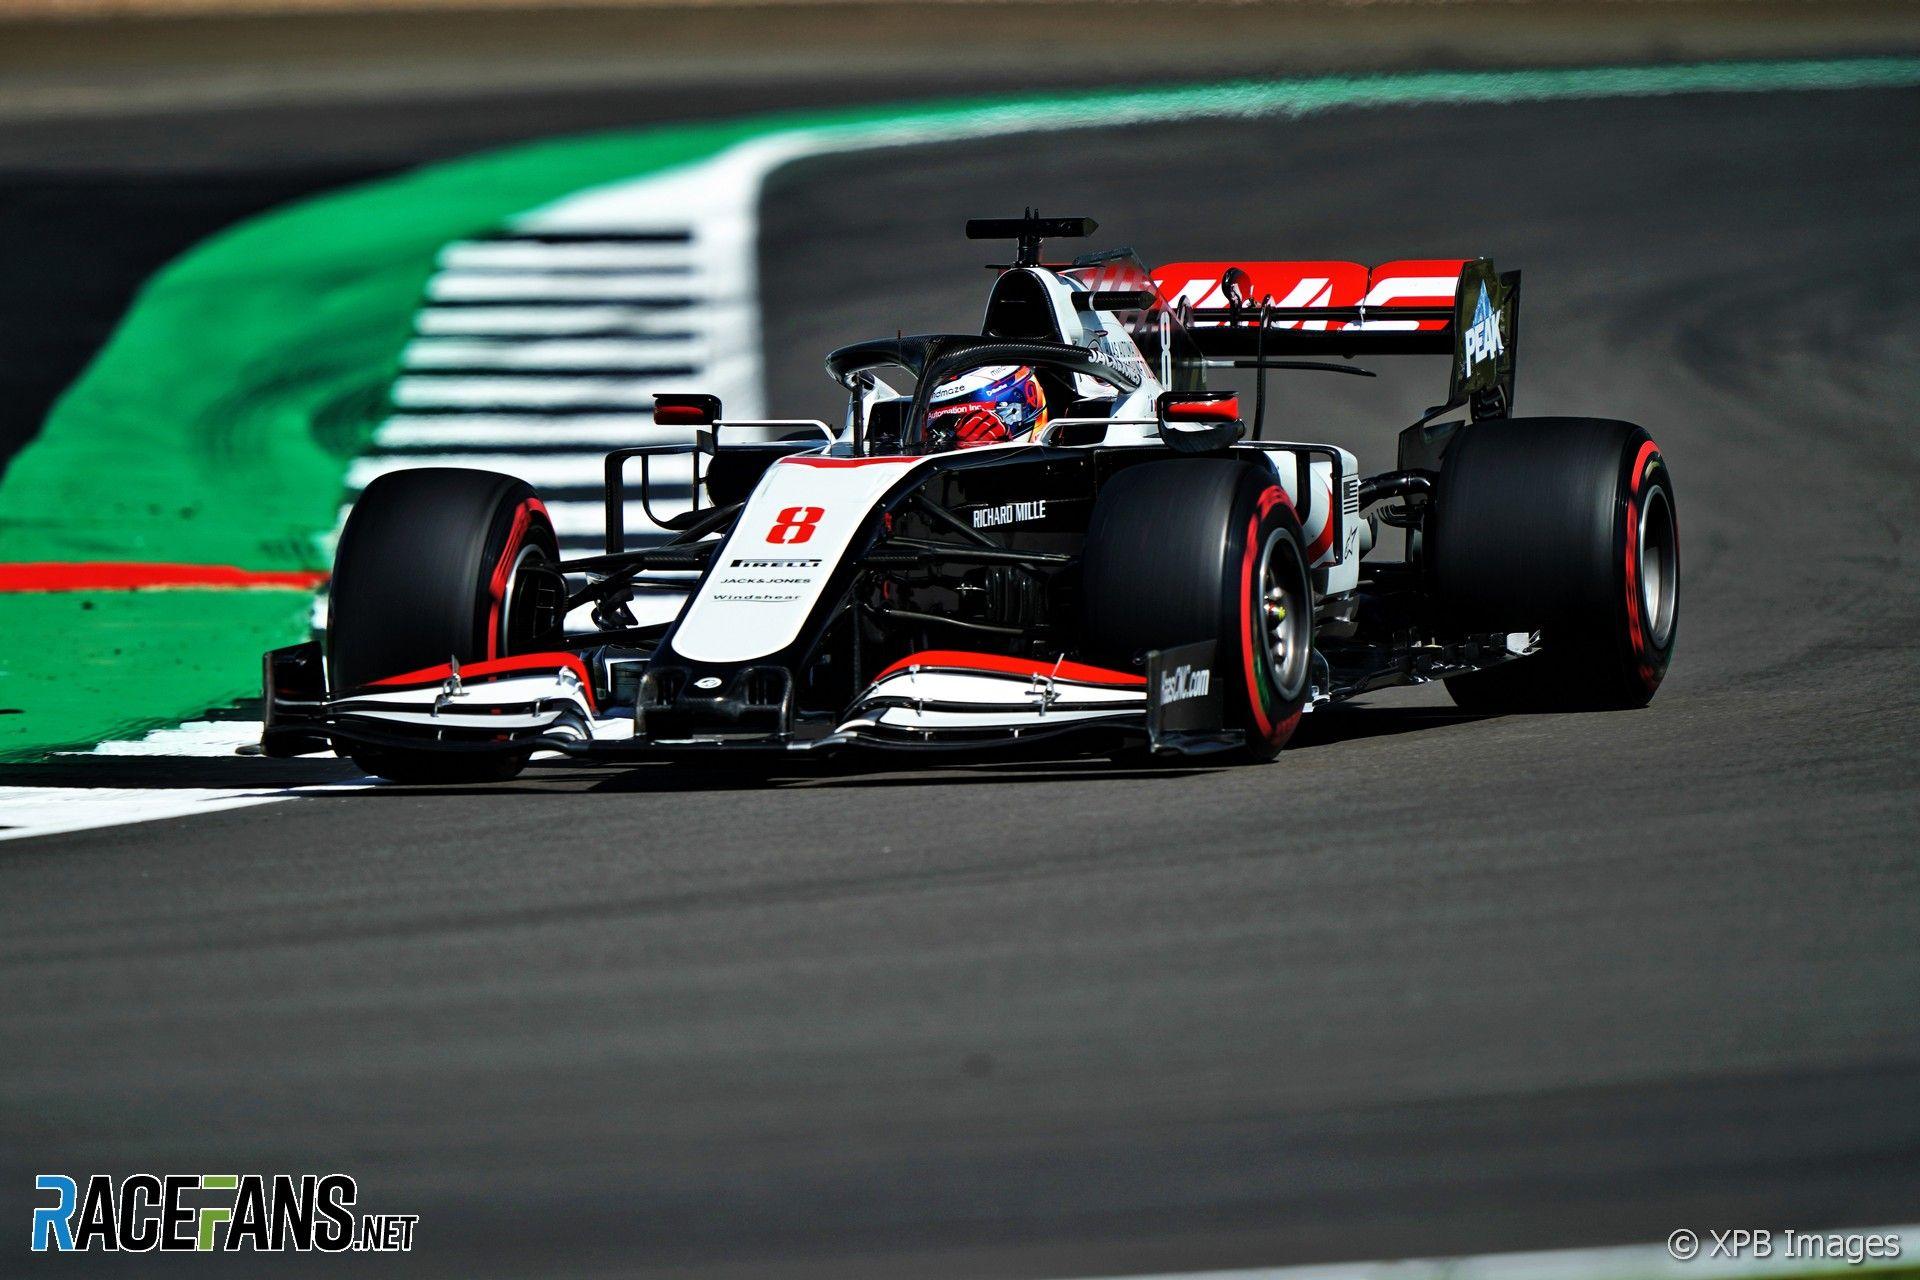 Romain Grosjean Fra Haas F1 Team Vf 20 31 07 2020 Formula 1 World Championship Rd 4 British Grand Prix Sil In 2020 British Grand Prix Grand Prix Romain Grosjean